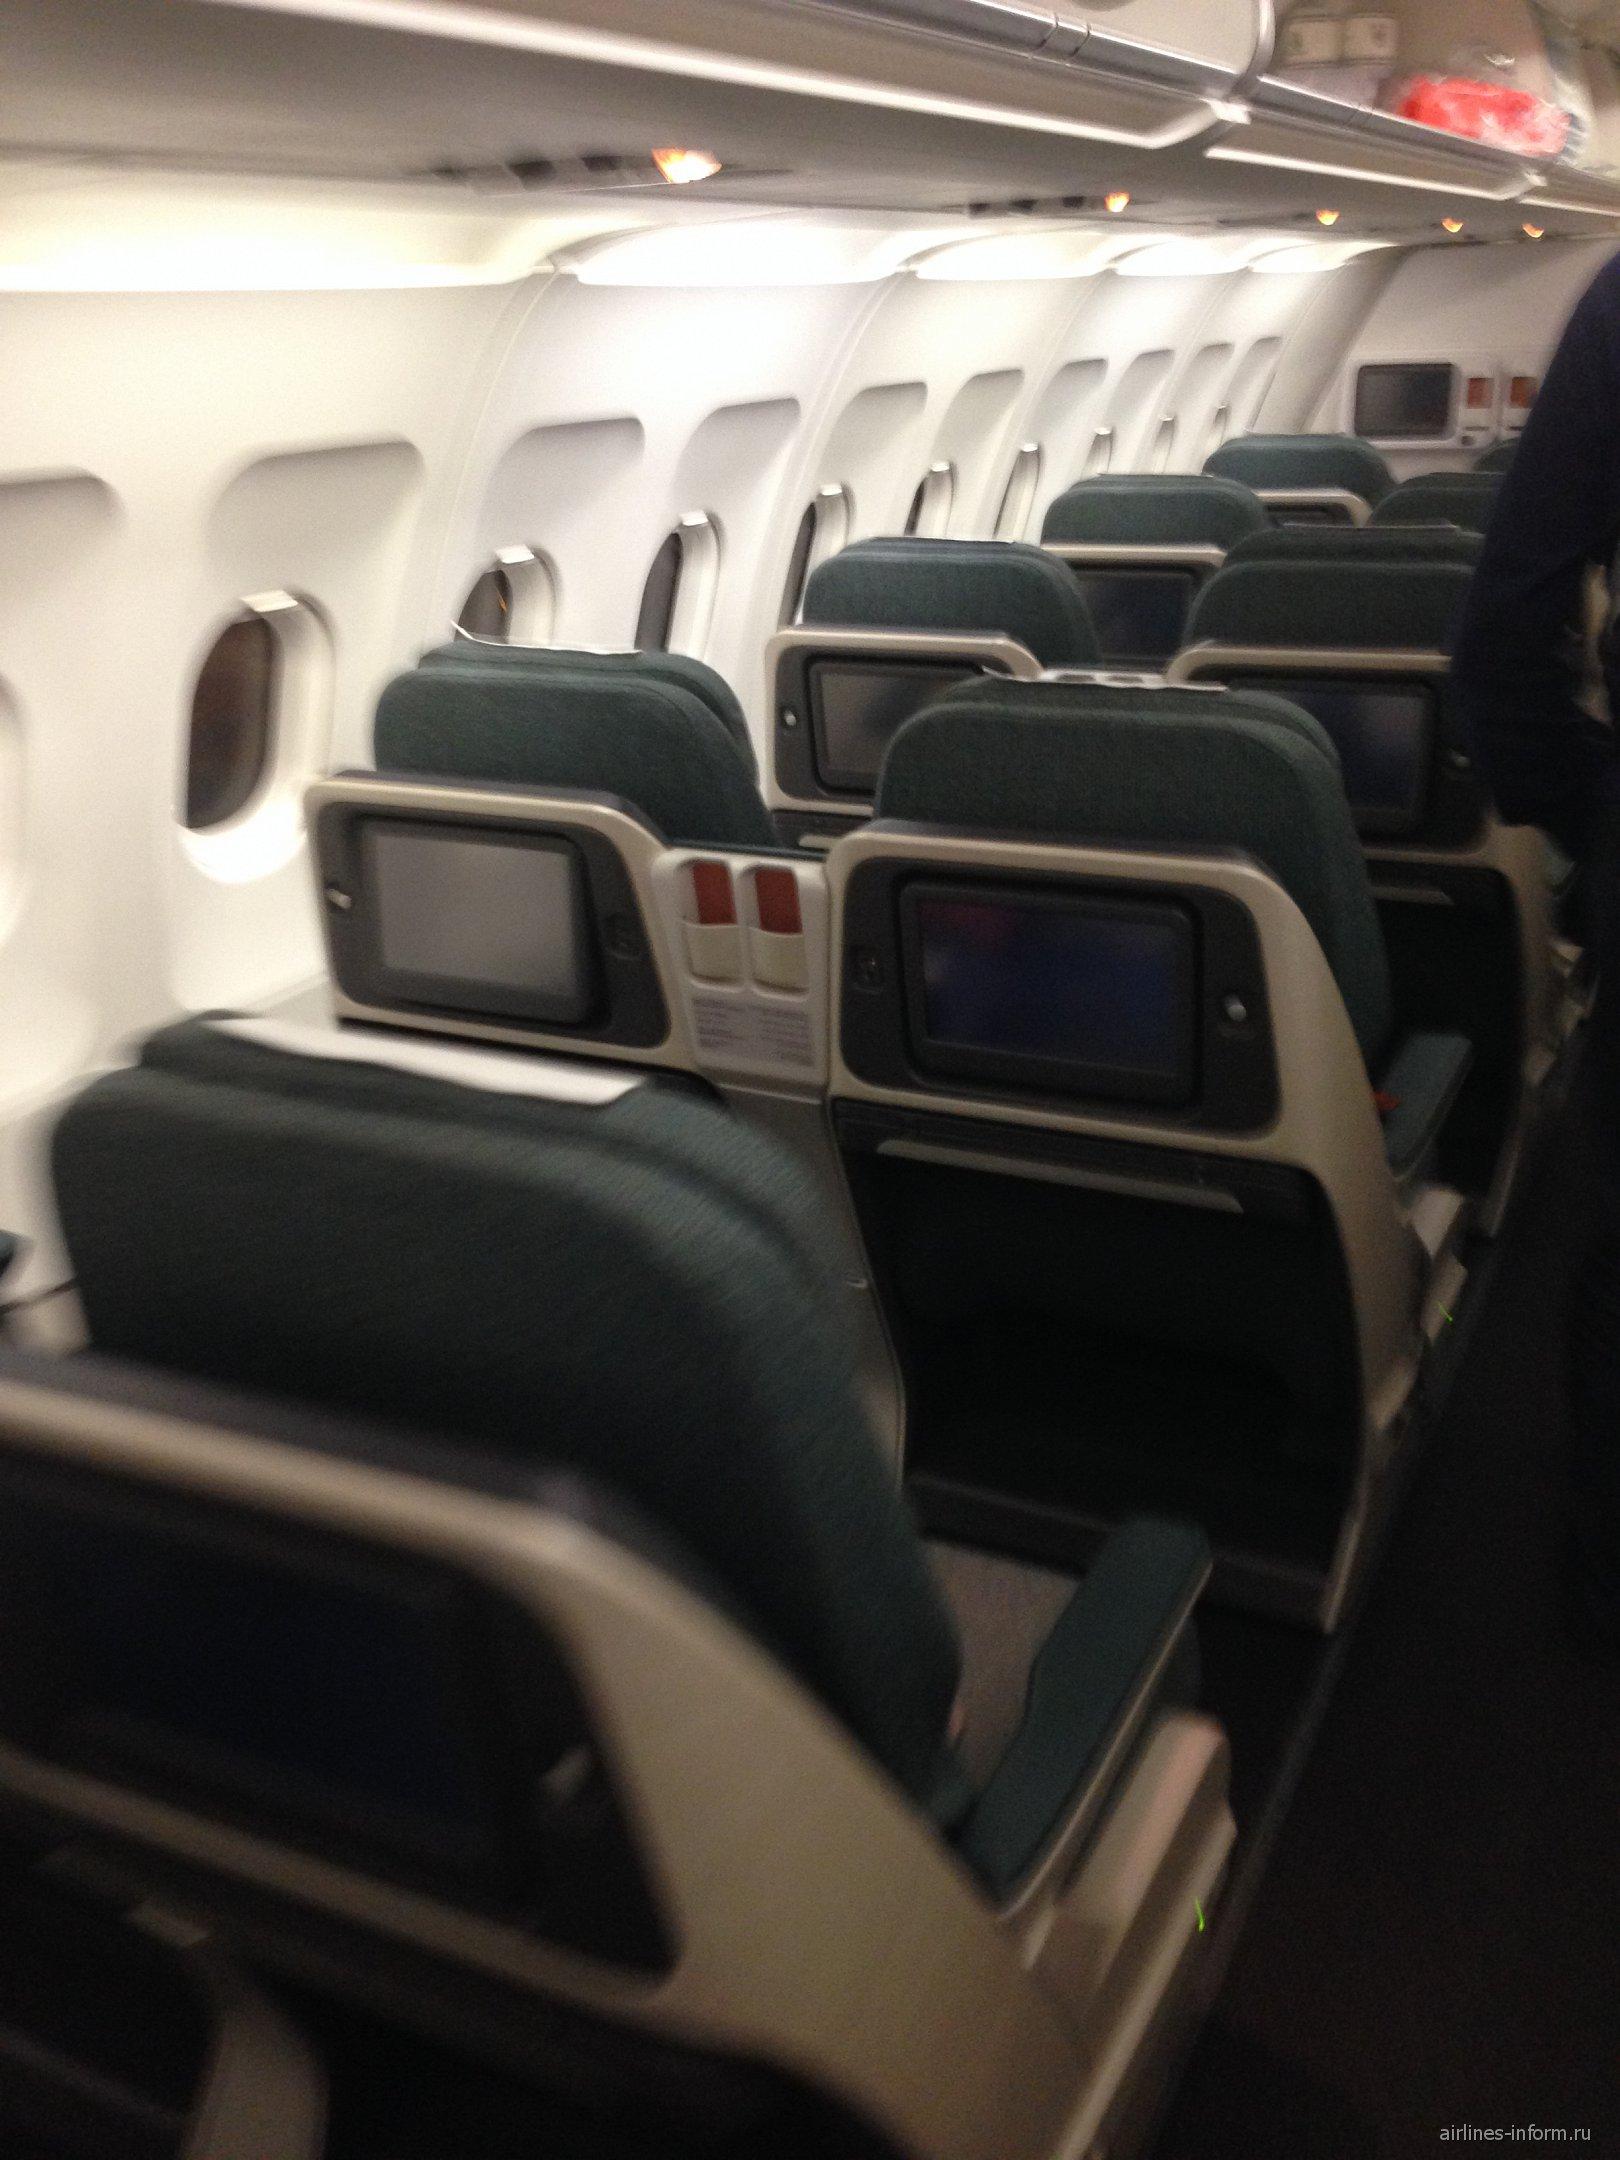 Салон самолета Airbus A321 авиакомпании Dragonair